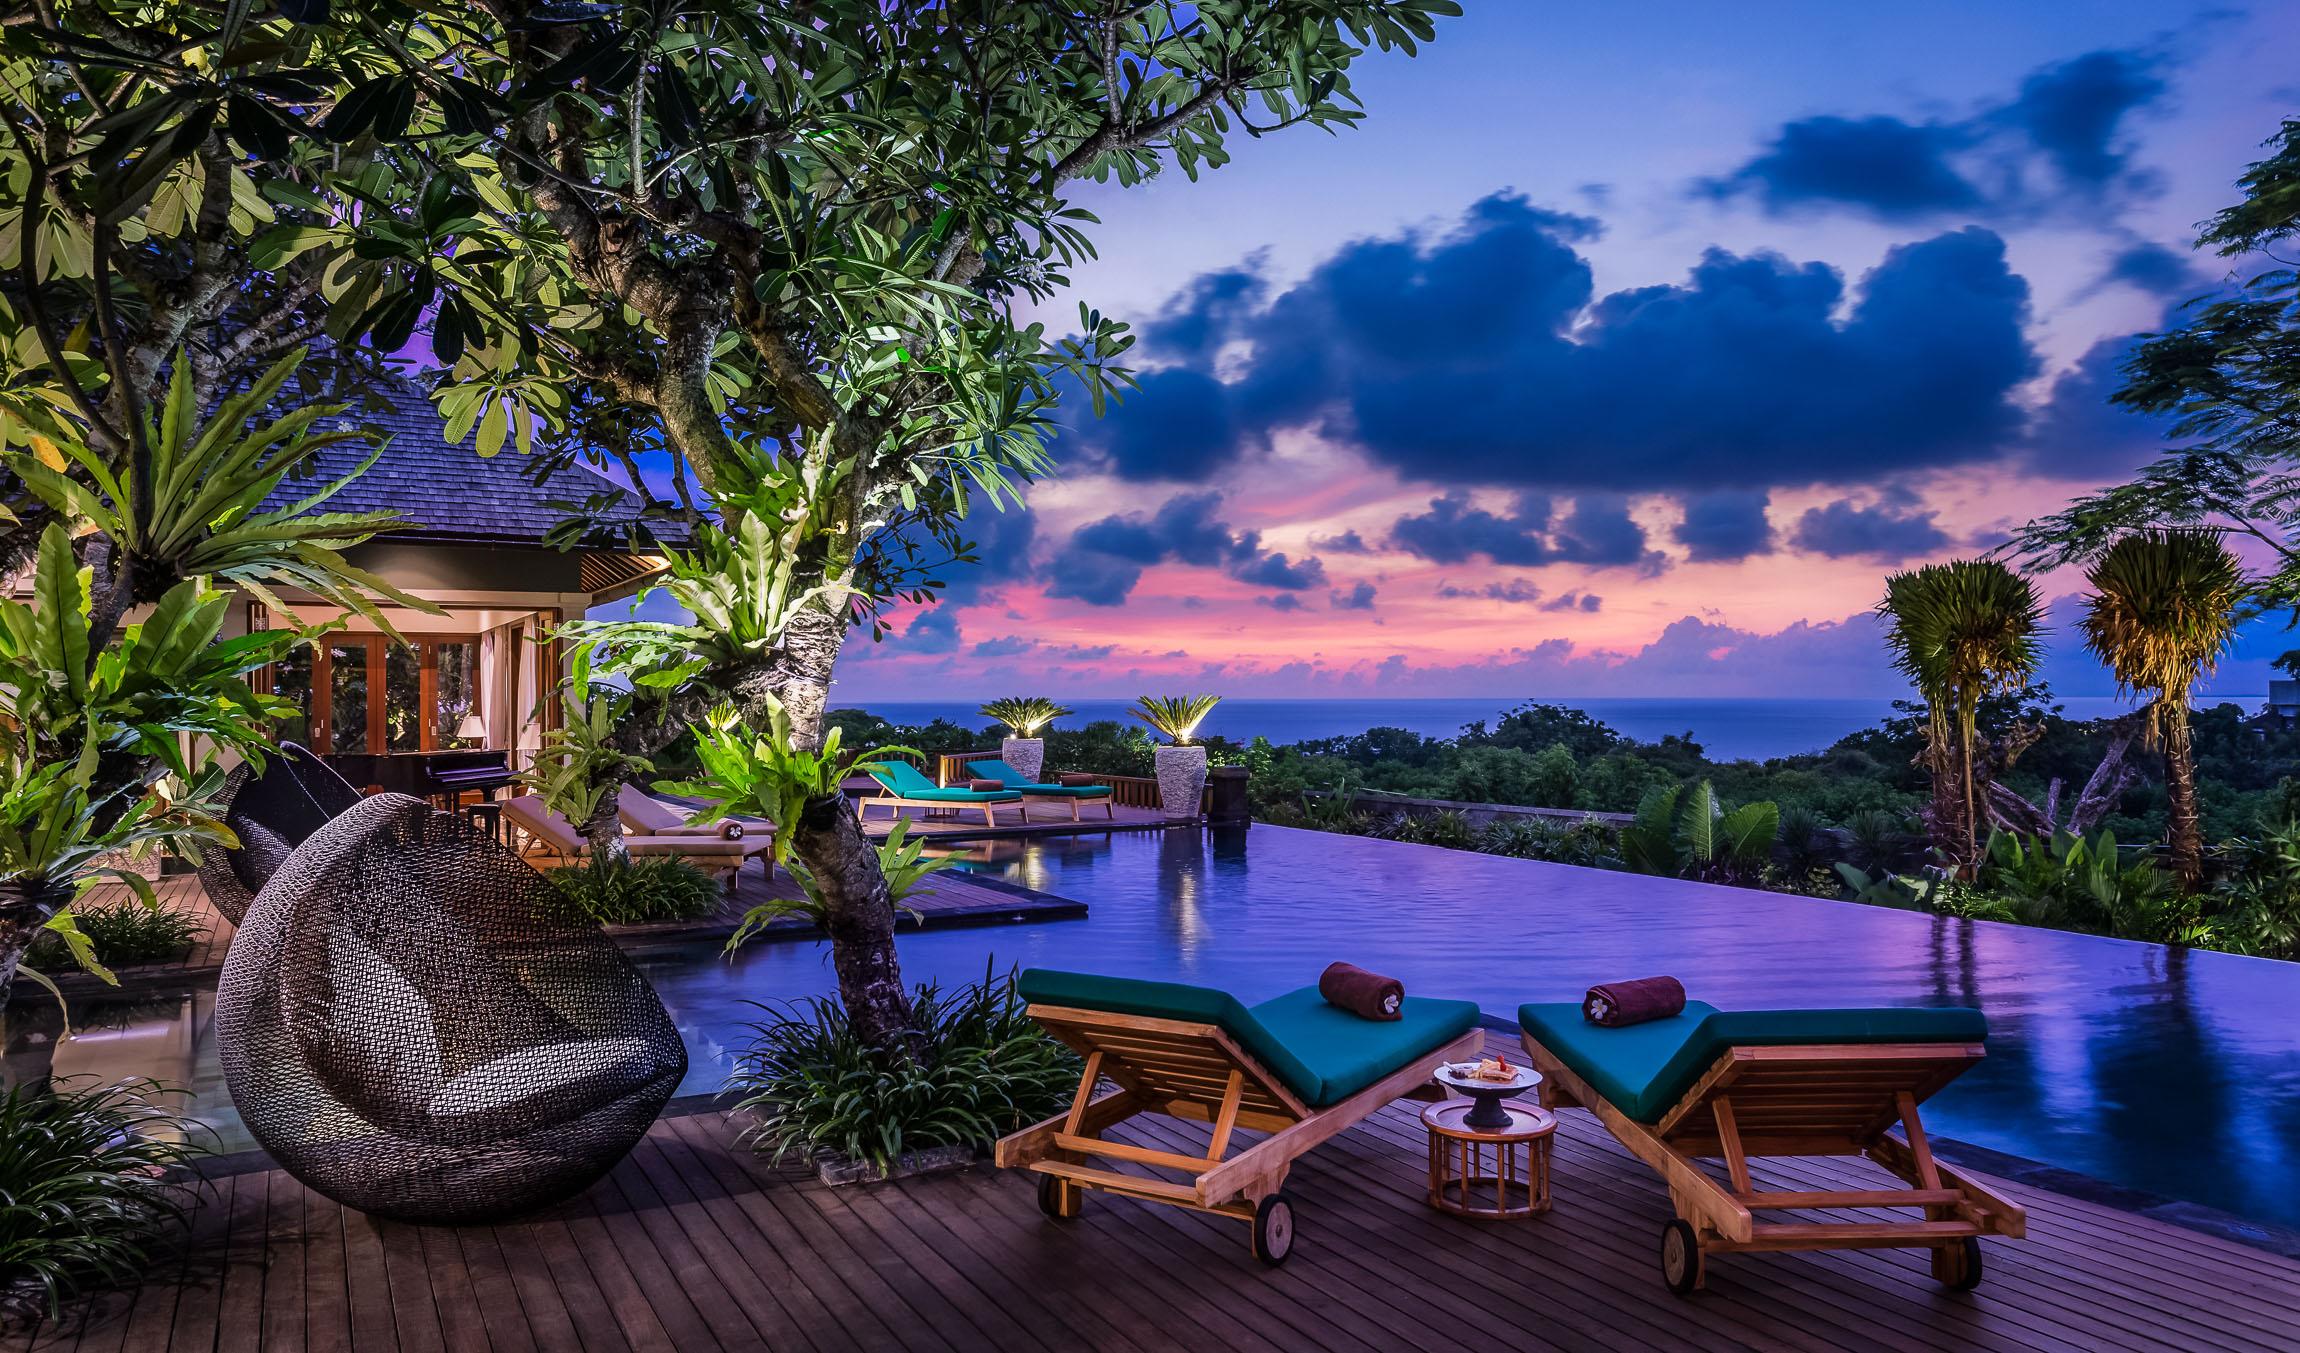 The Shanti Residence Nusa Dua